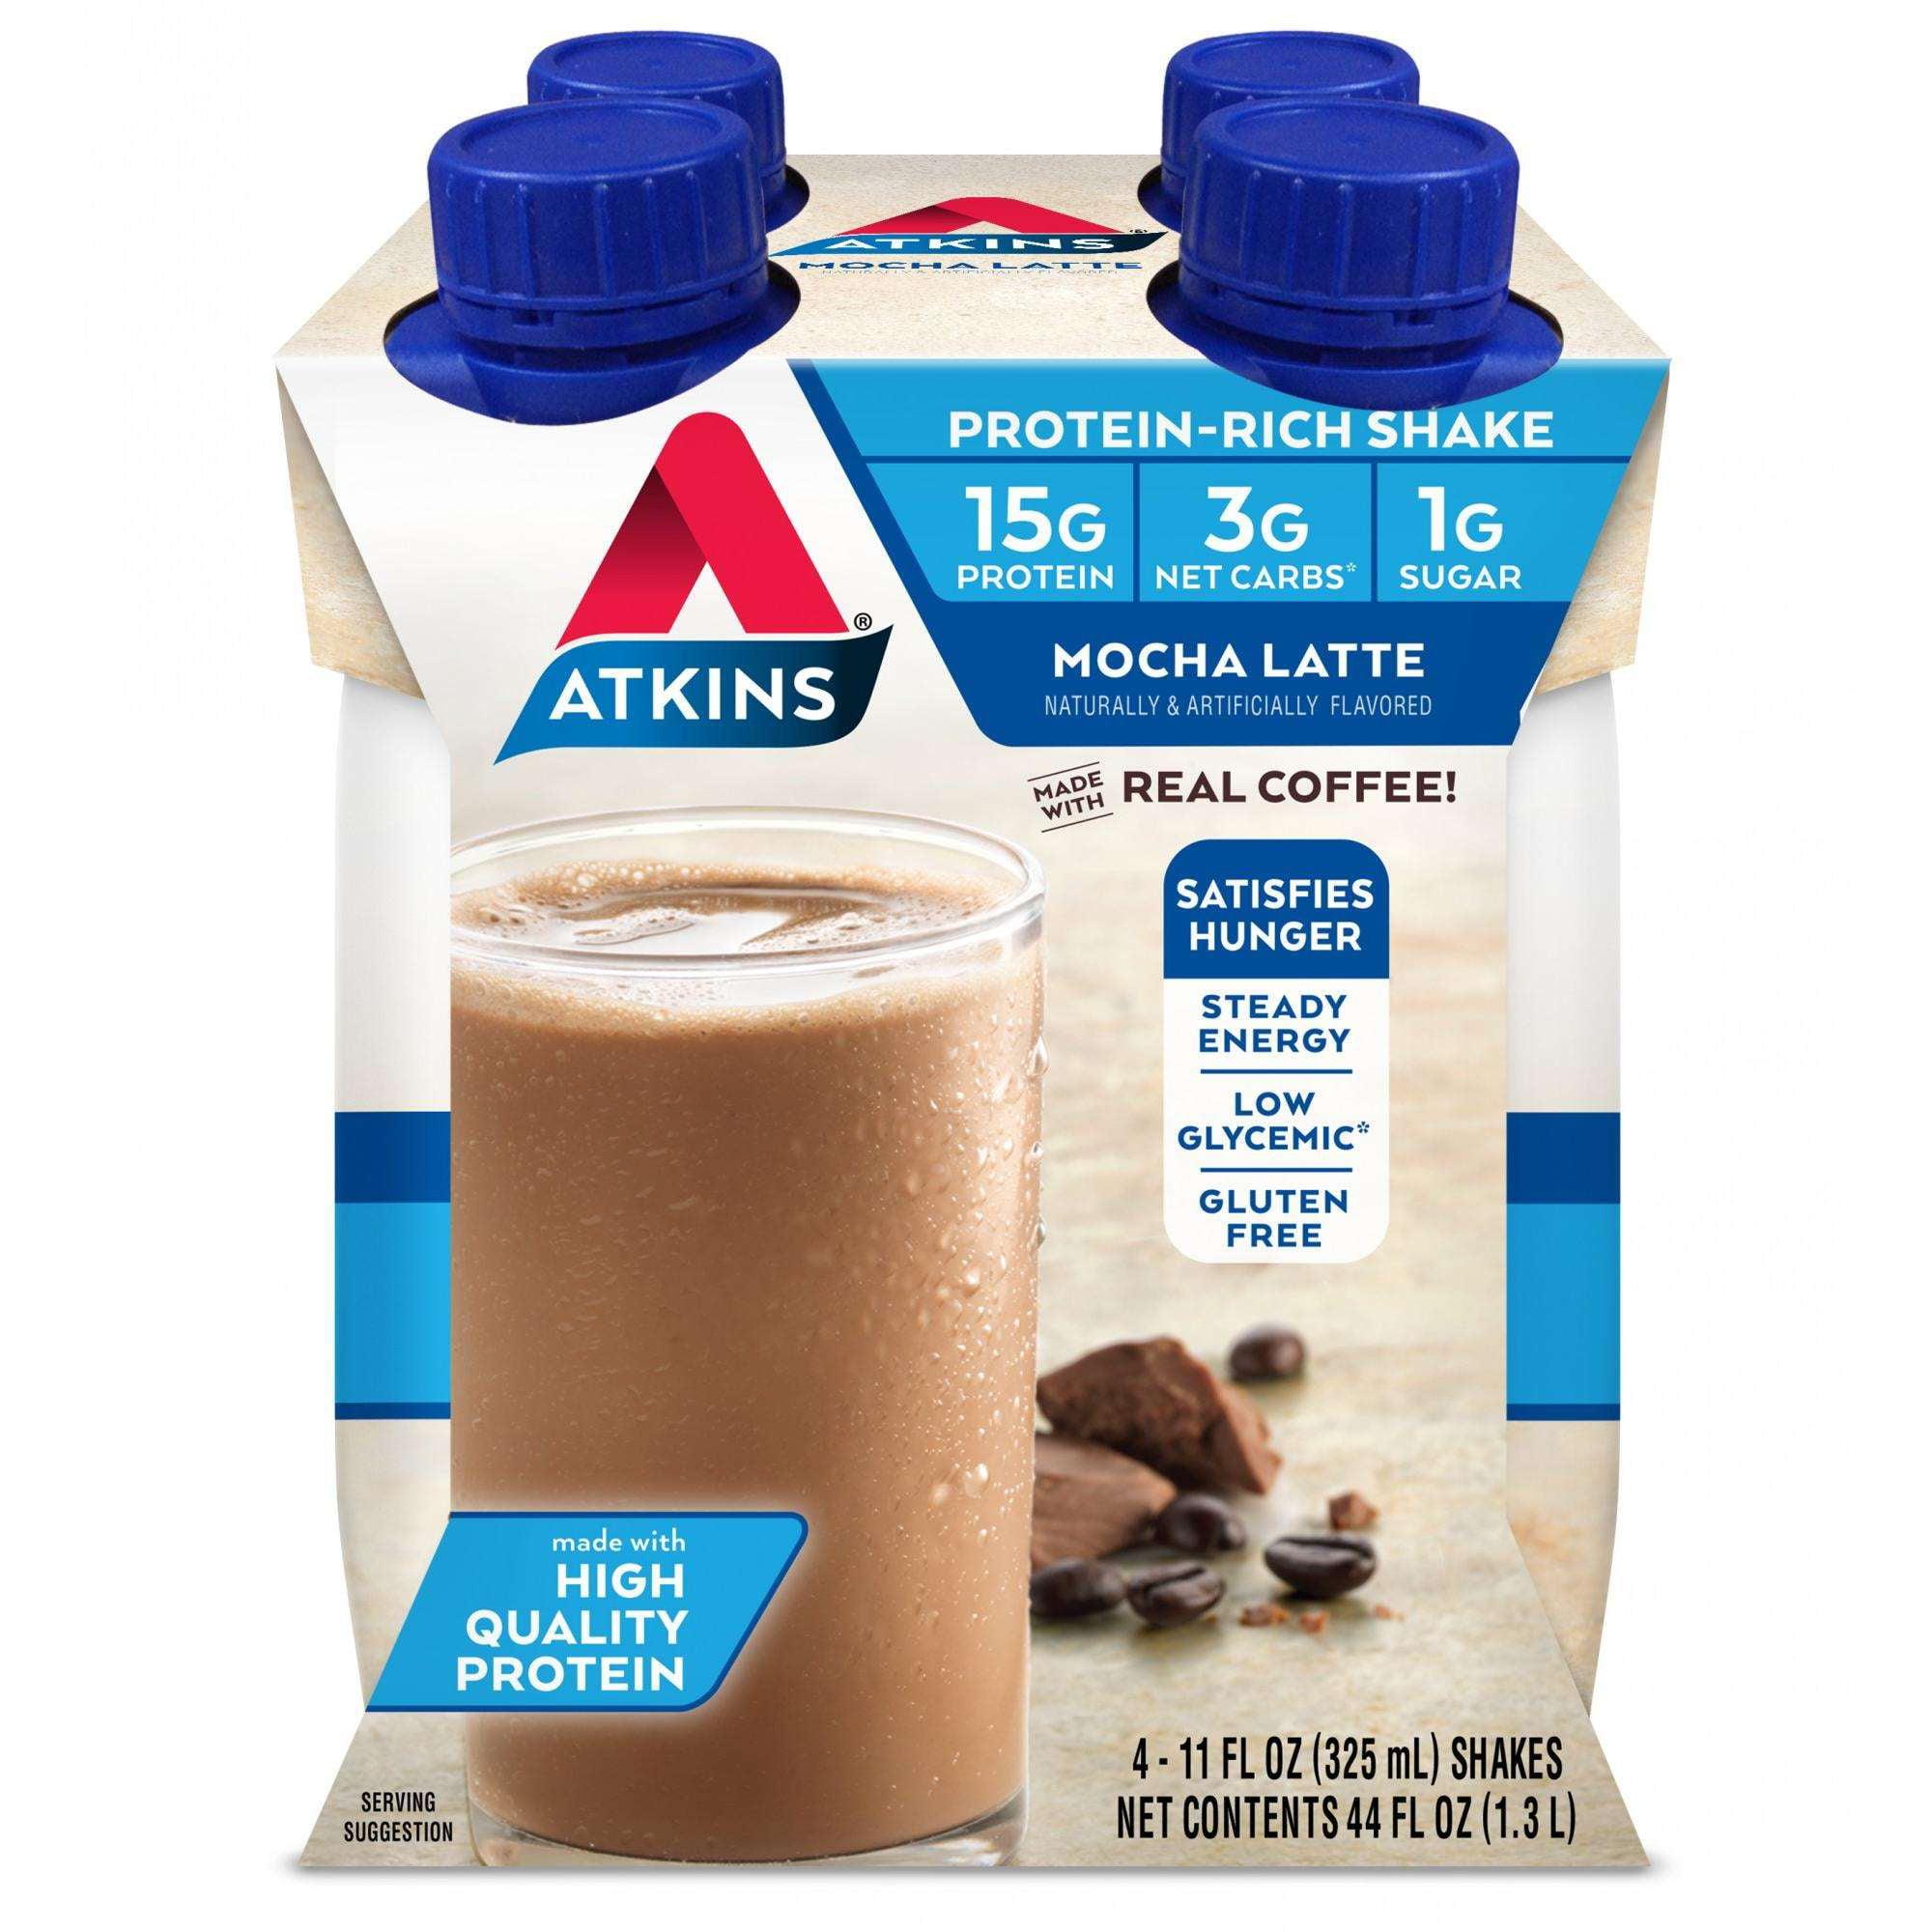 Atkins Mocha Latte Shake, 11Fl oz, 4-pack (Ready To Drink)